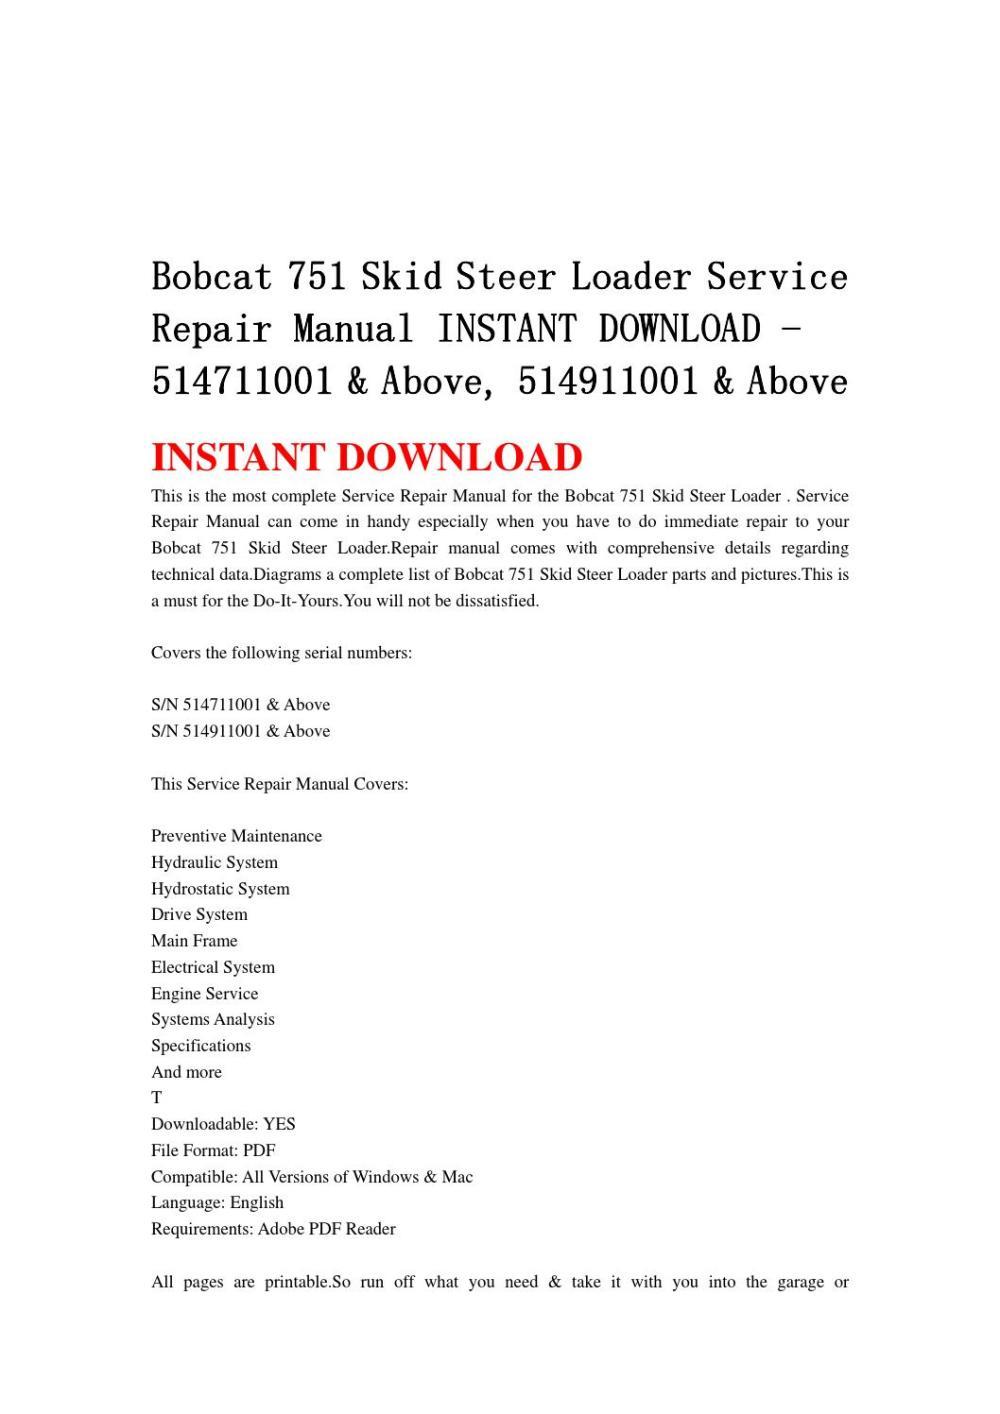 medium resolution of bobcat 751 skid steer loader service repair manual instant download 514711001 above 514911001 a